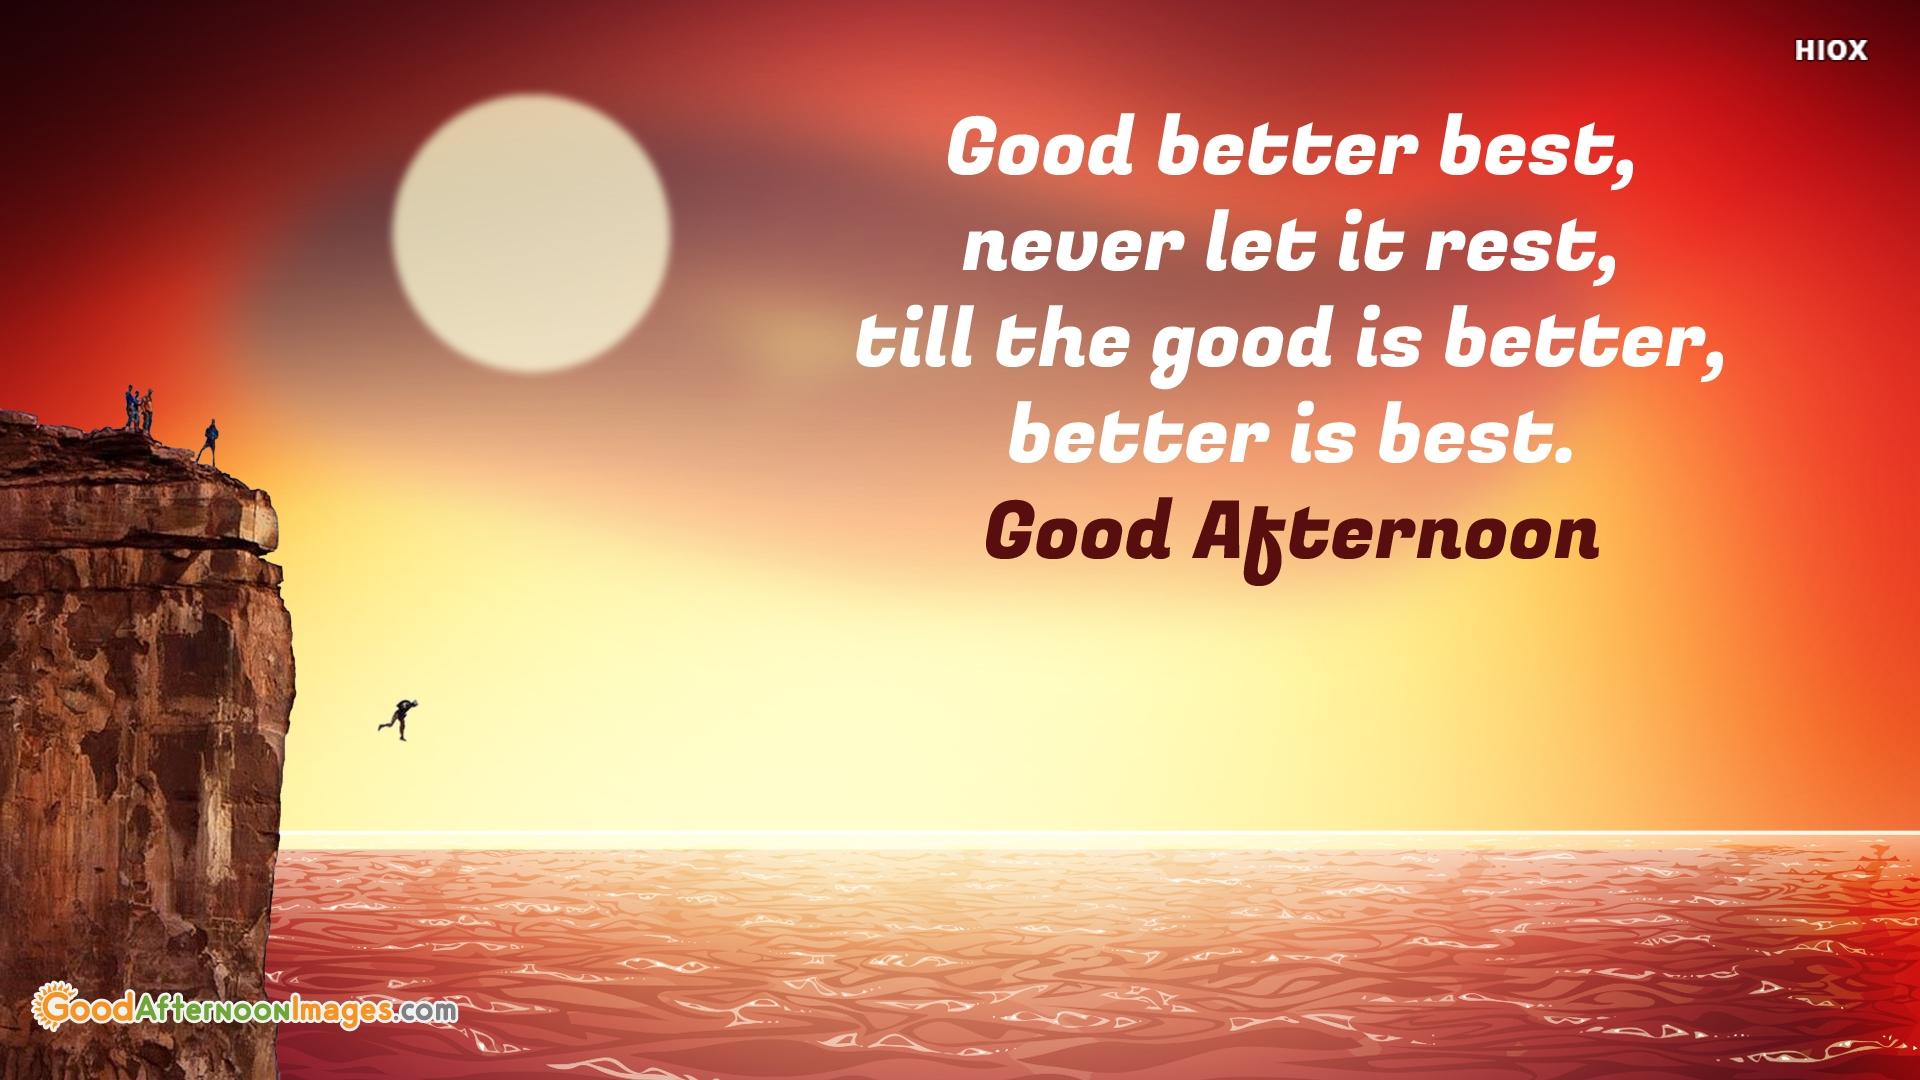 Good Better Best, Never Let It Rest, Till The Good is Better, Better is Best.